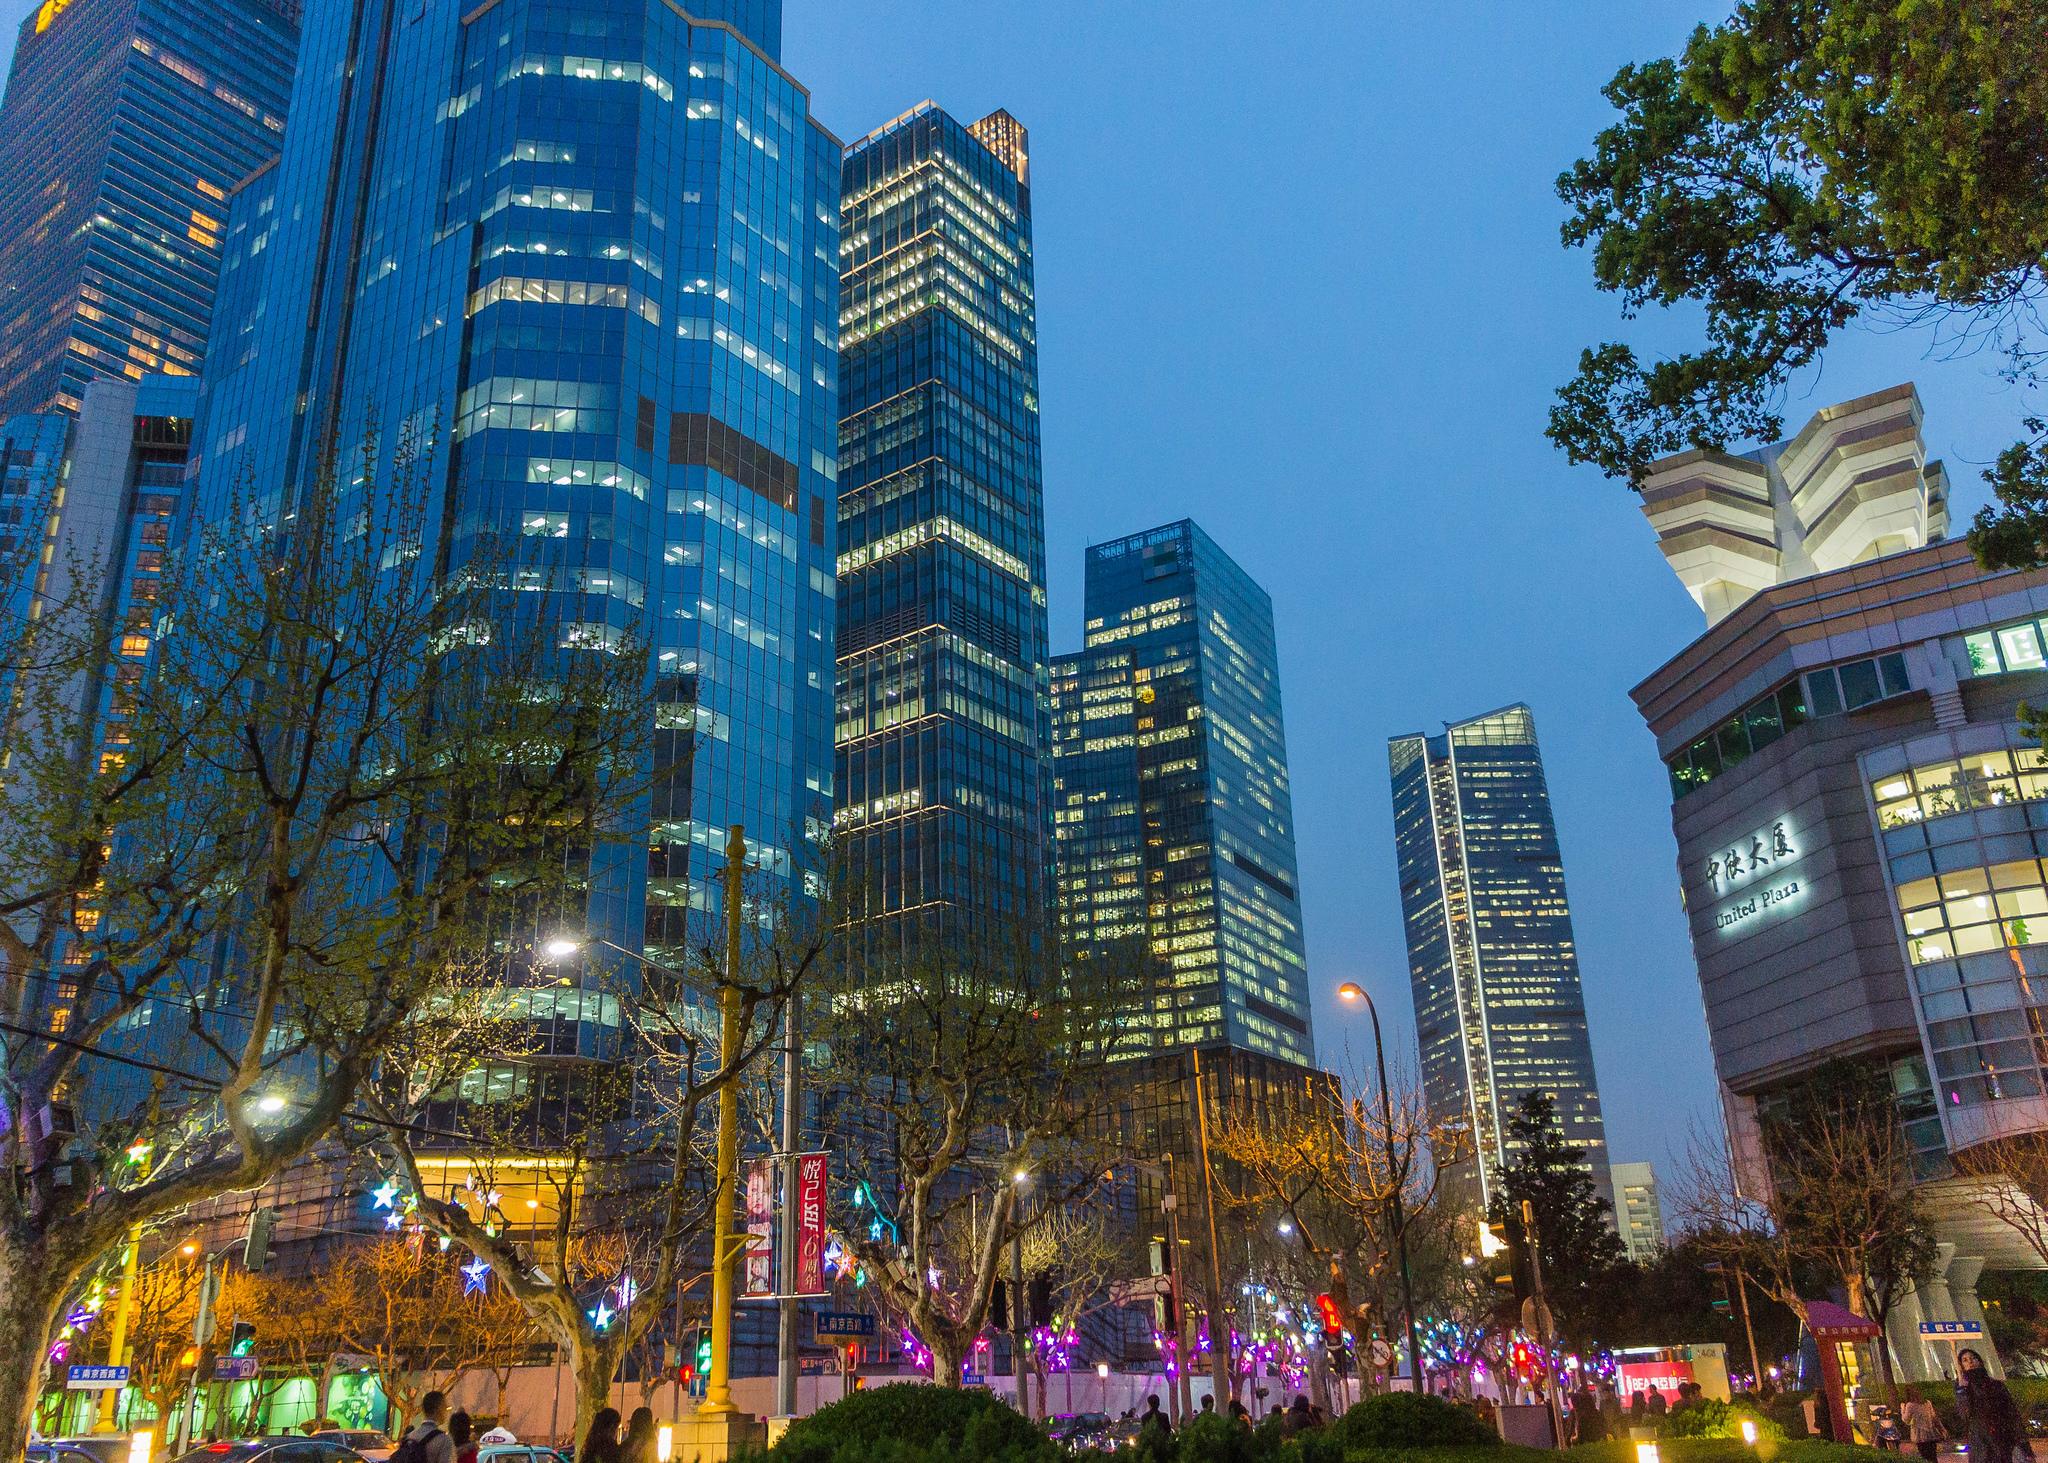 West Nanjing | ©David Leo Veklser/Flickr